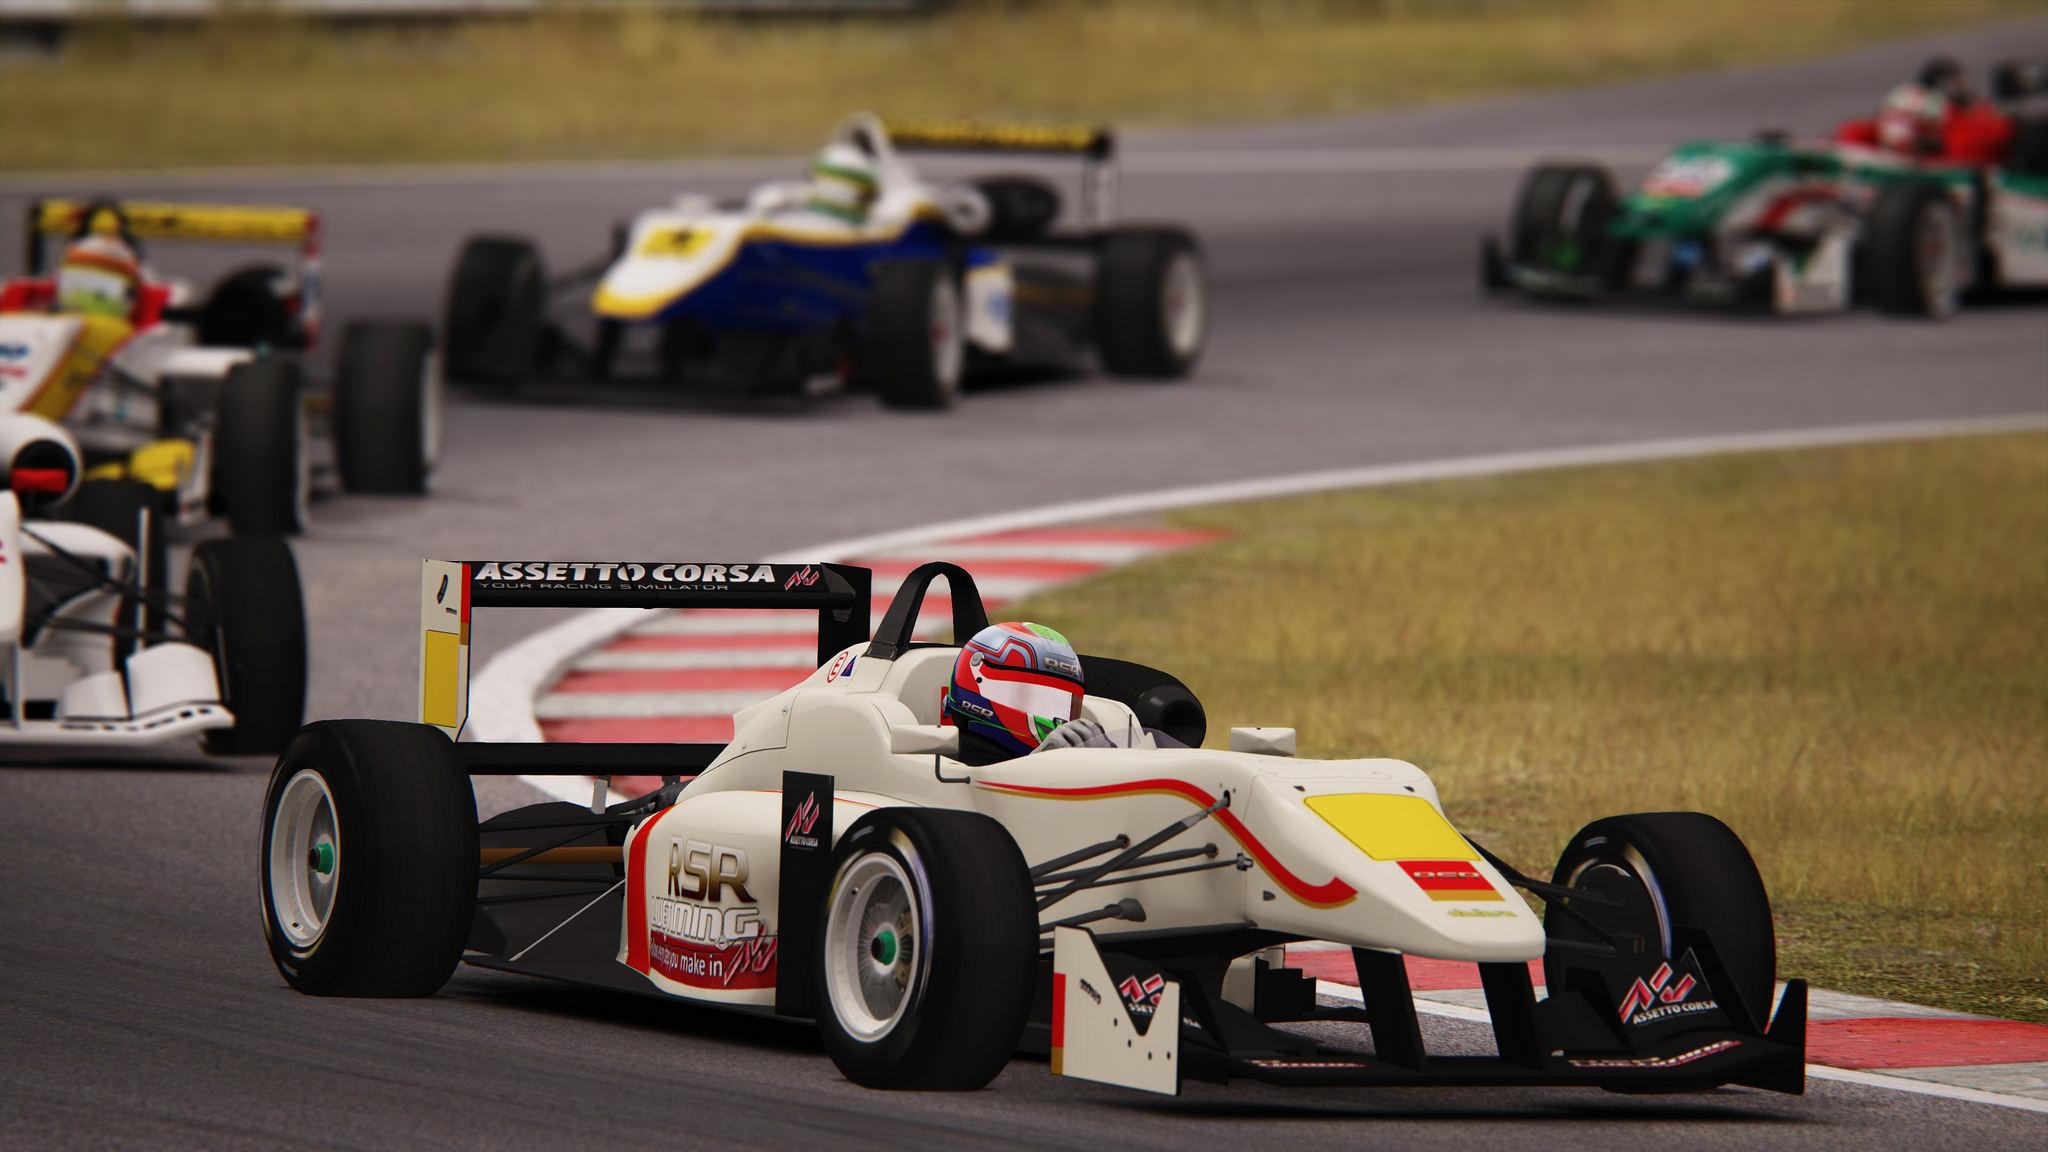 Rsr Formula 3 1 0 For Ac Released Virtualr Net Sim